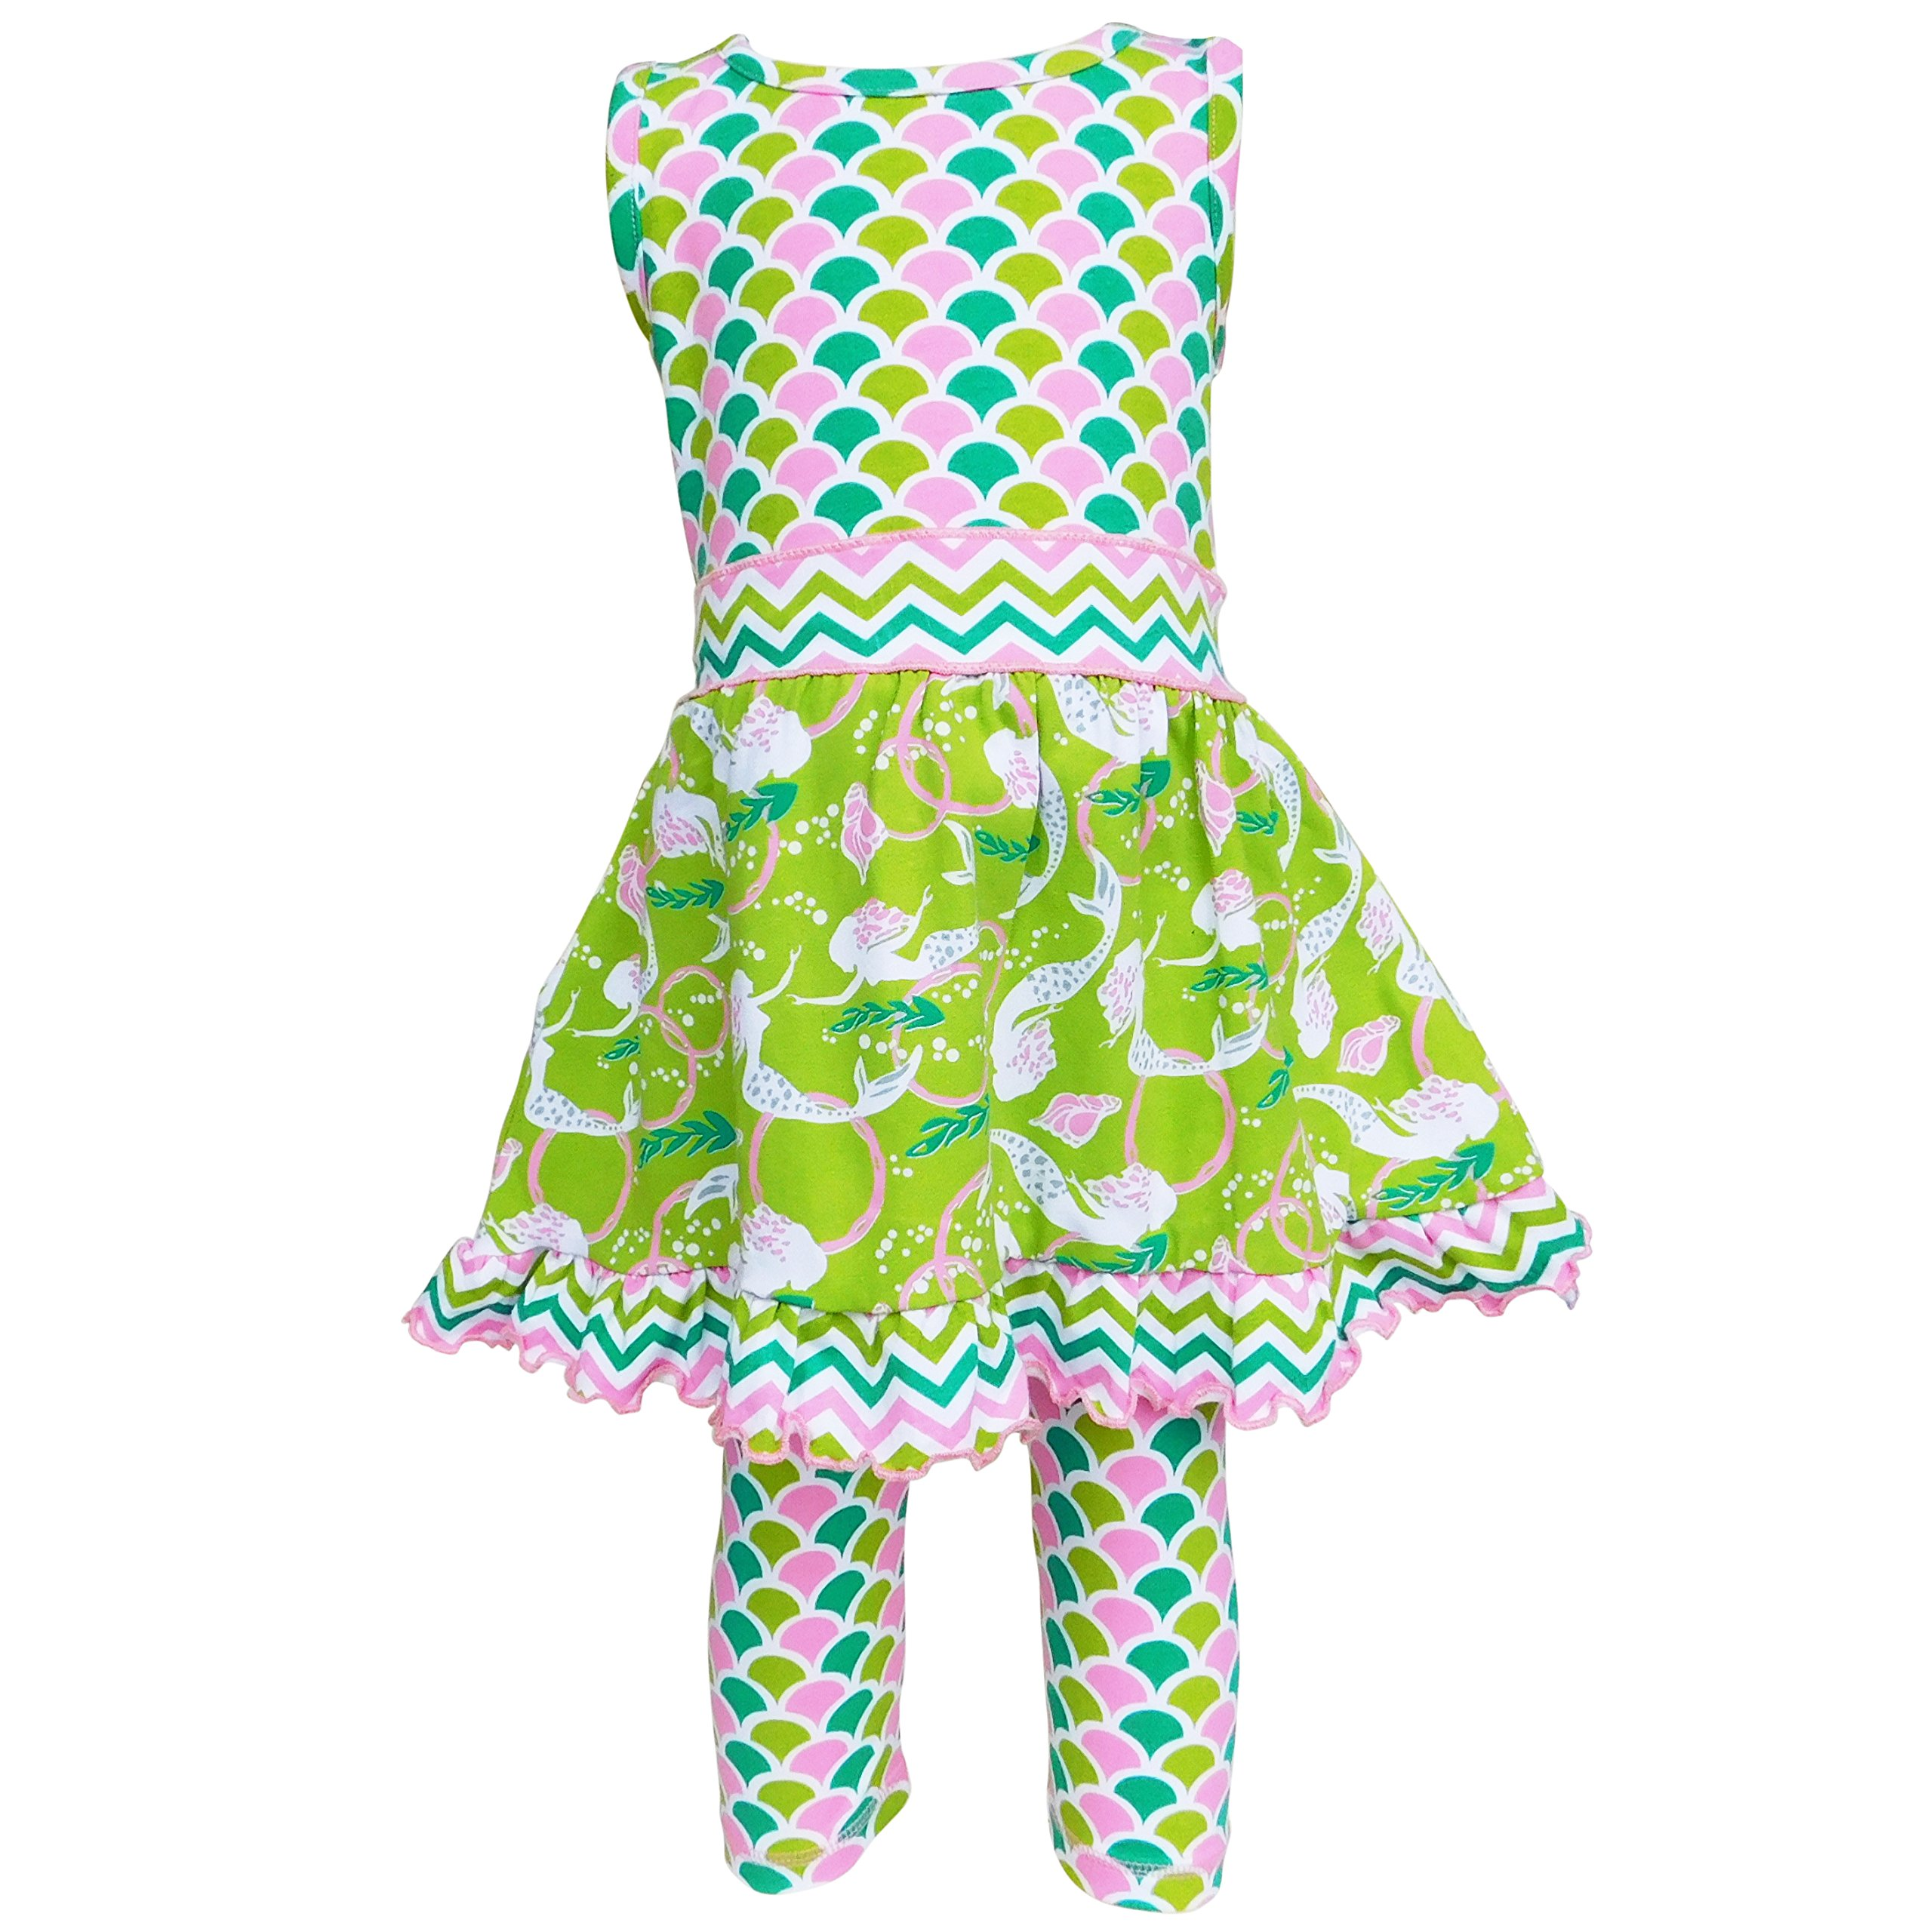 AnnLoren Girls sz 7/8 Boutique Summer Mermaids Dress and Capri Clothing Outfit